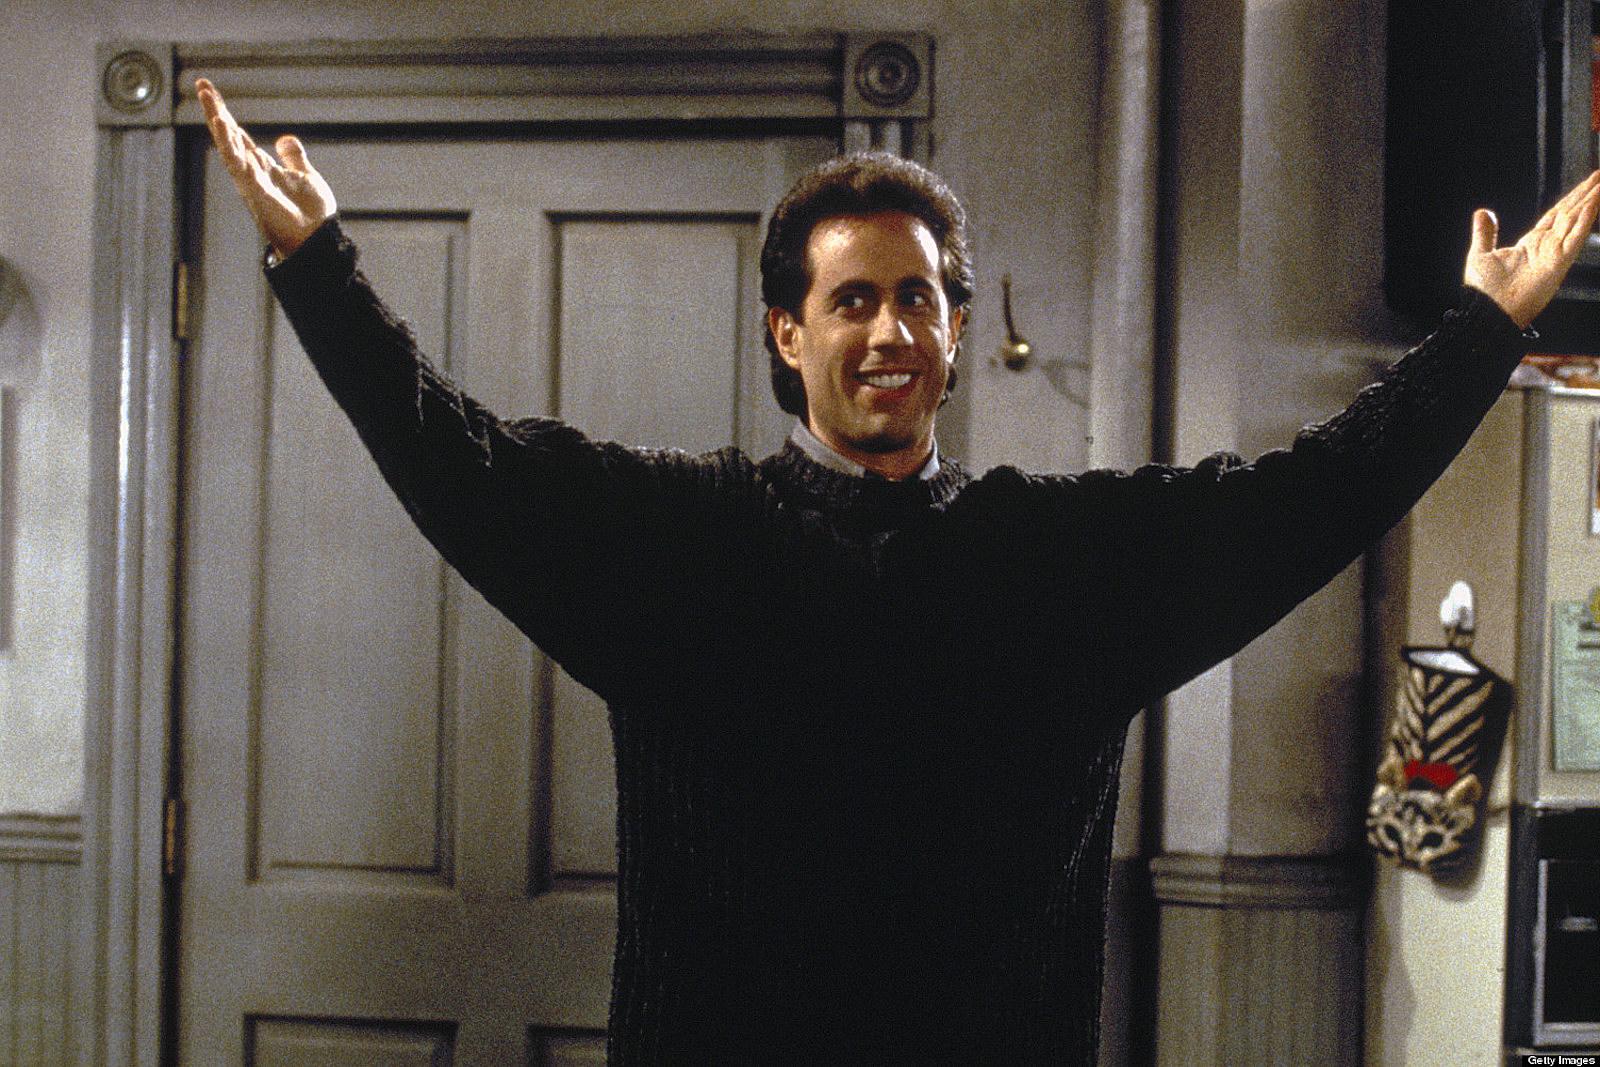 Seinfeld man hands full episode